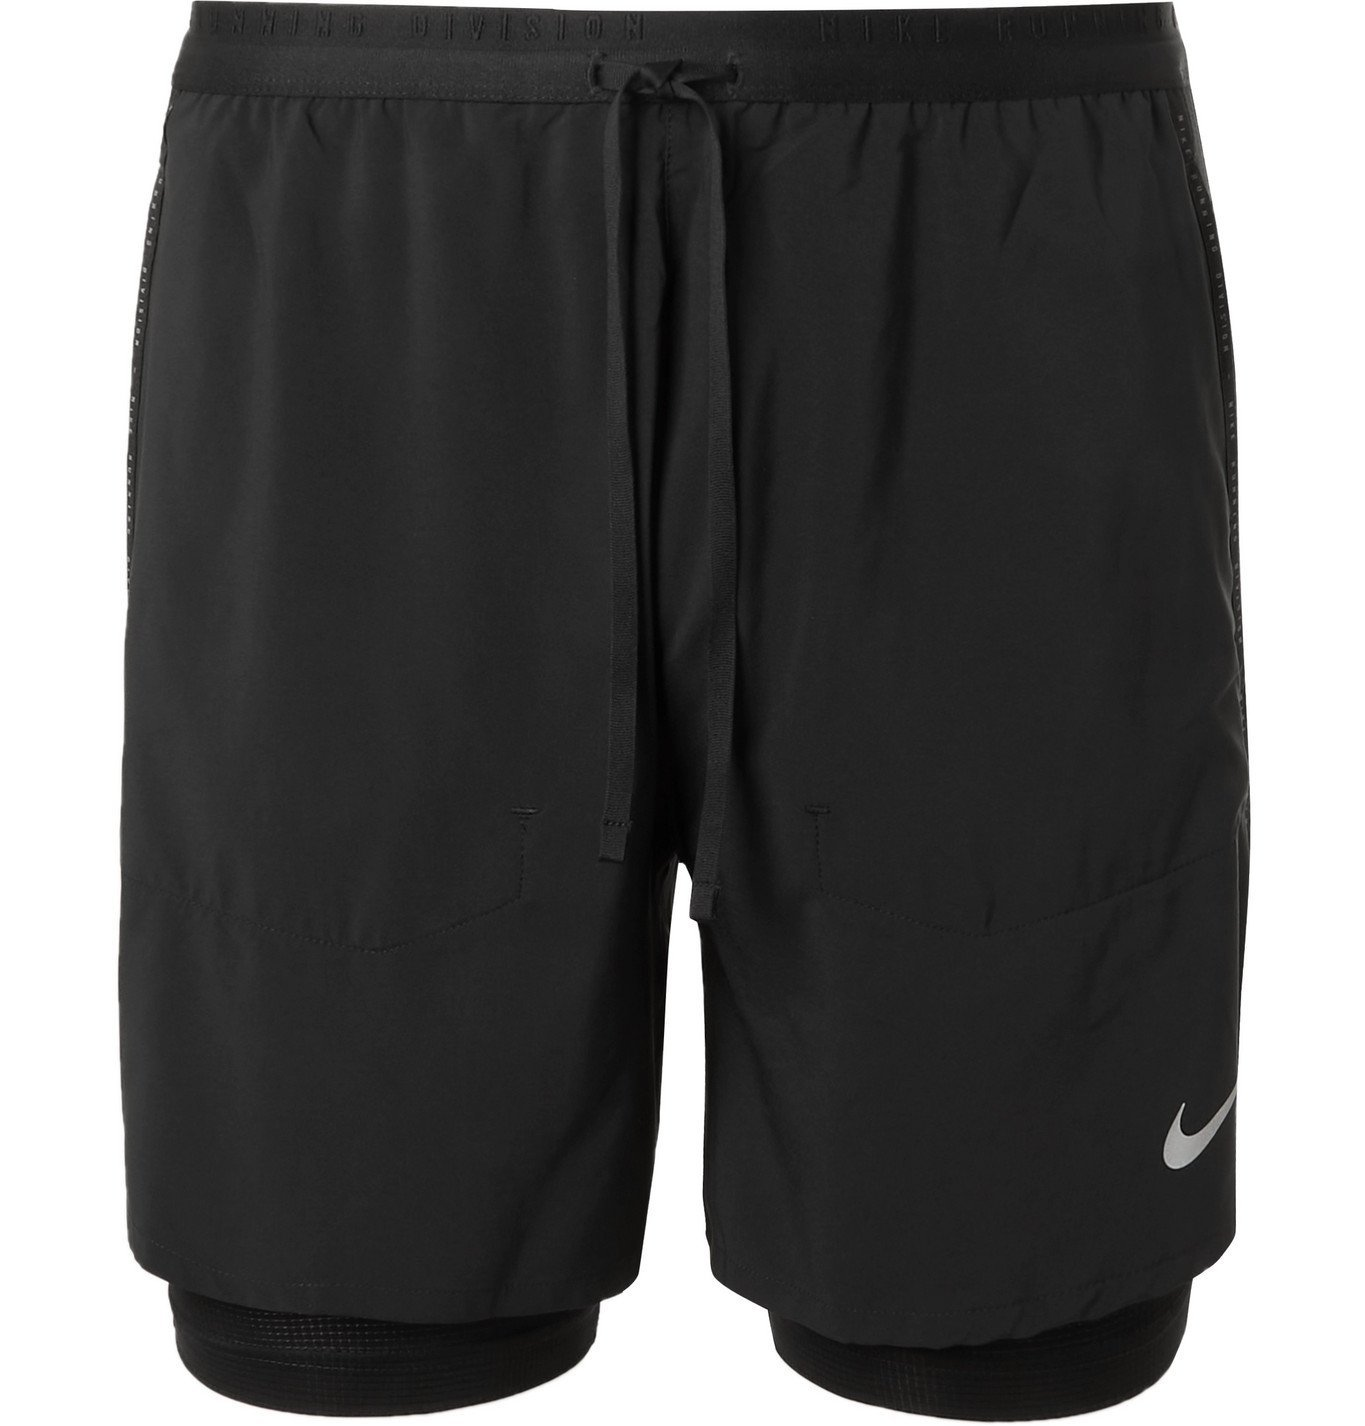 Nike Running - Flex Stride Slim-Fit Layered Dri-FIT Shell Running Shorts - Black